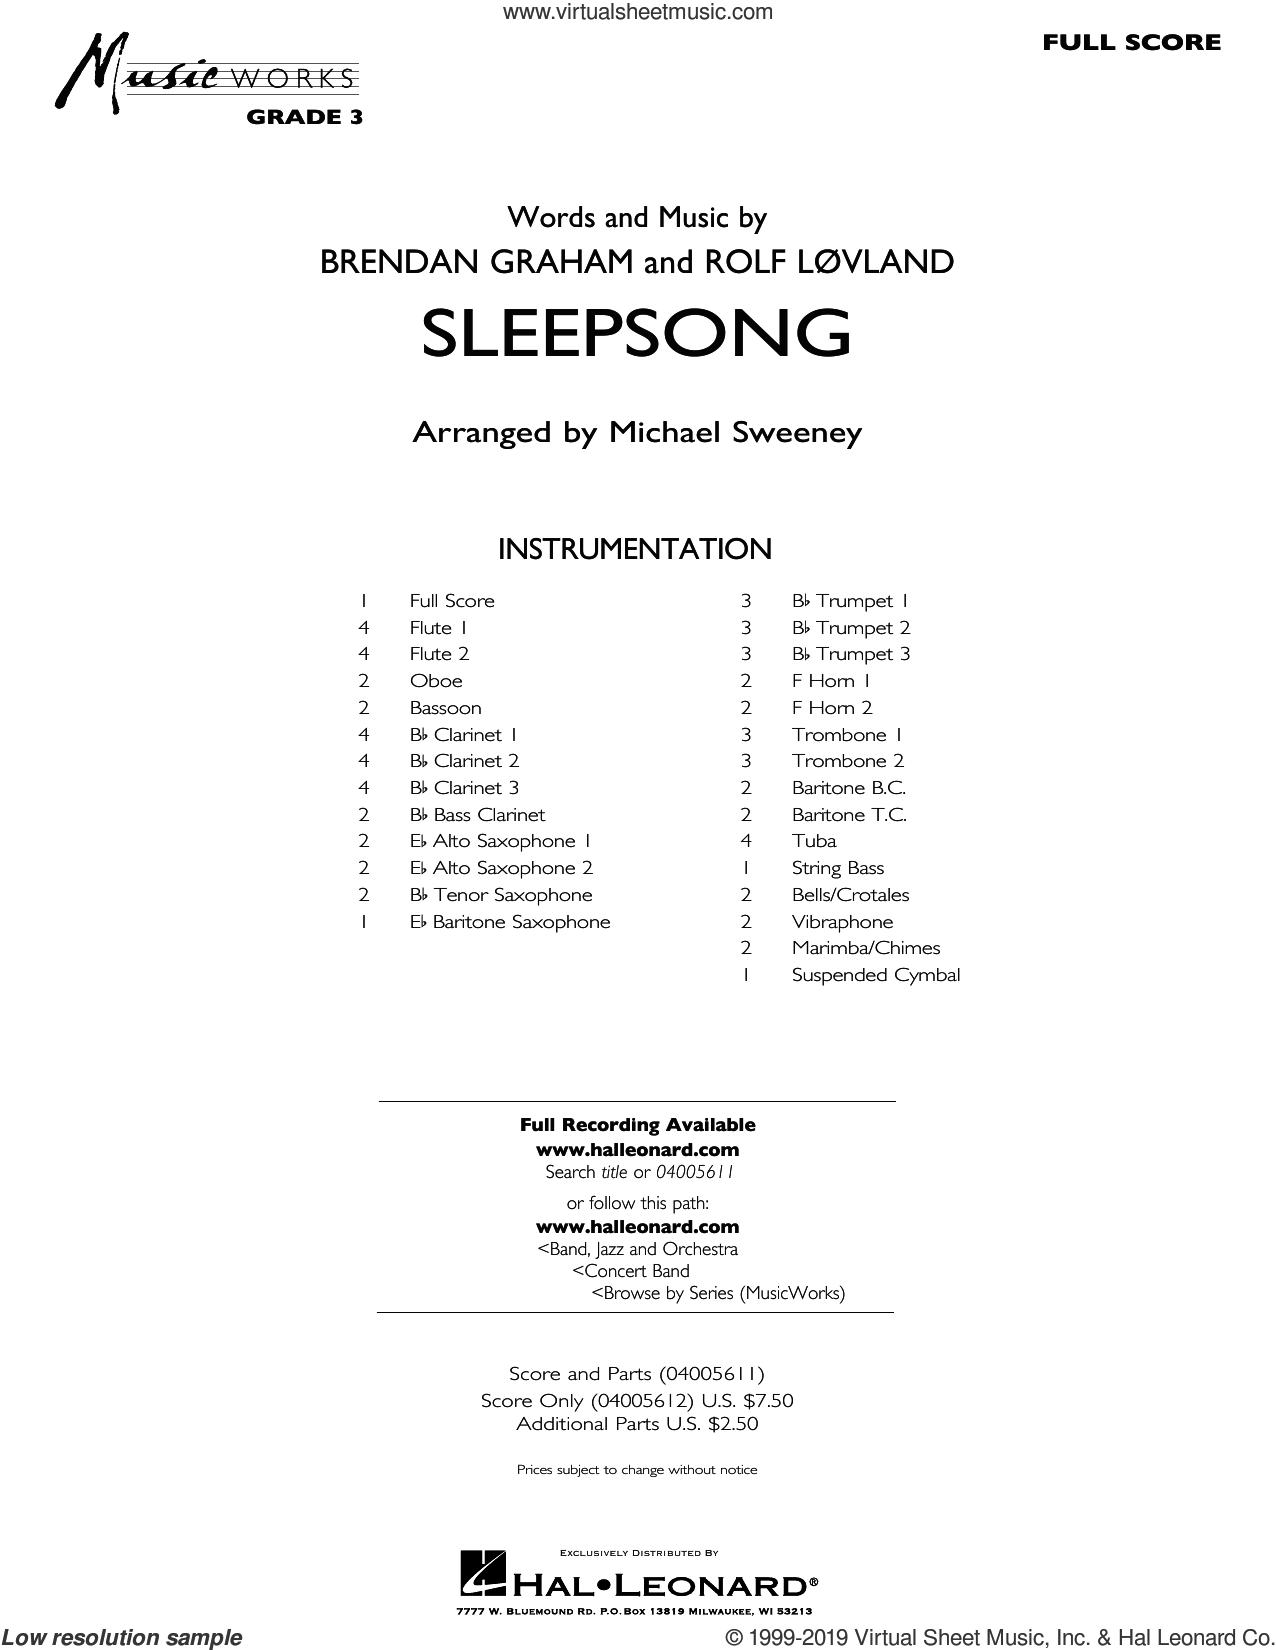 Sleepsong (arr. Michael Sweeney) (COMPLETE) sheet music for concert band by Michael Sweeney, Brendan Graham, Rolf Lovland and Secret Garden, classical score, intermediate skill level